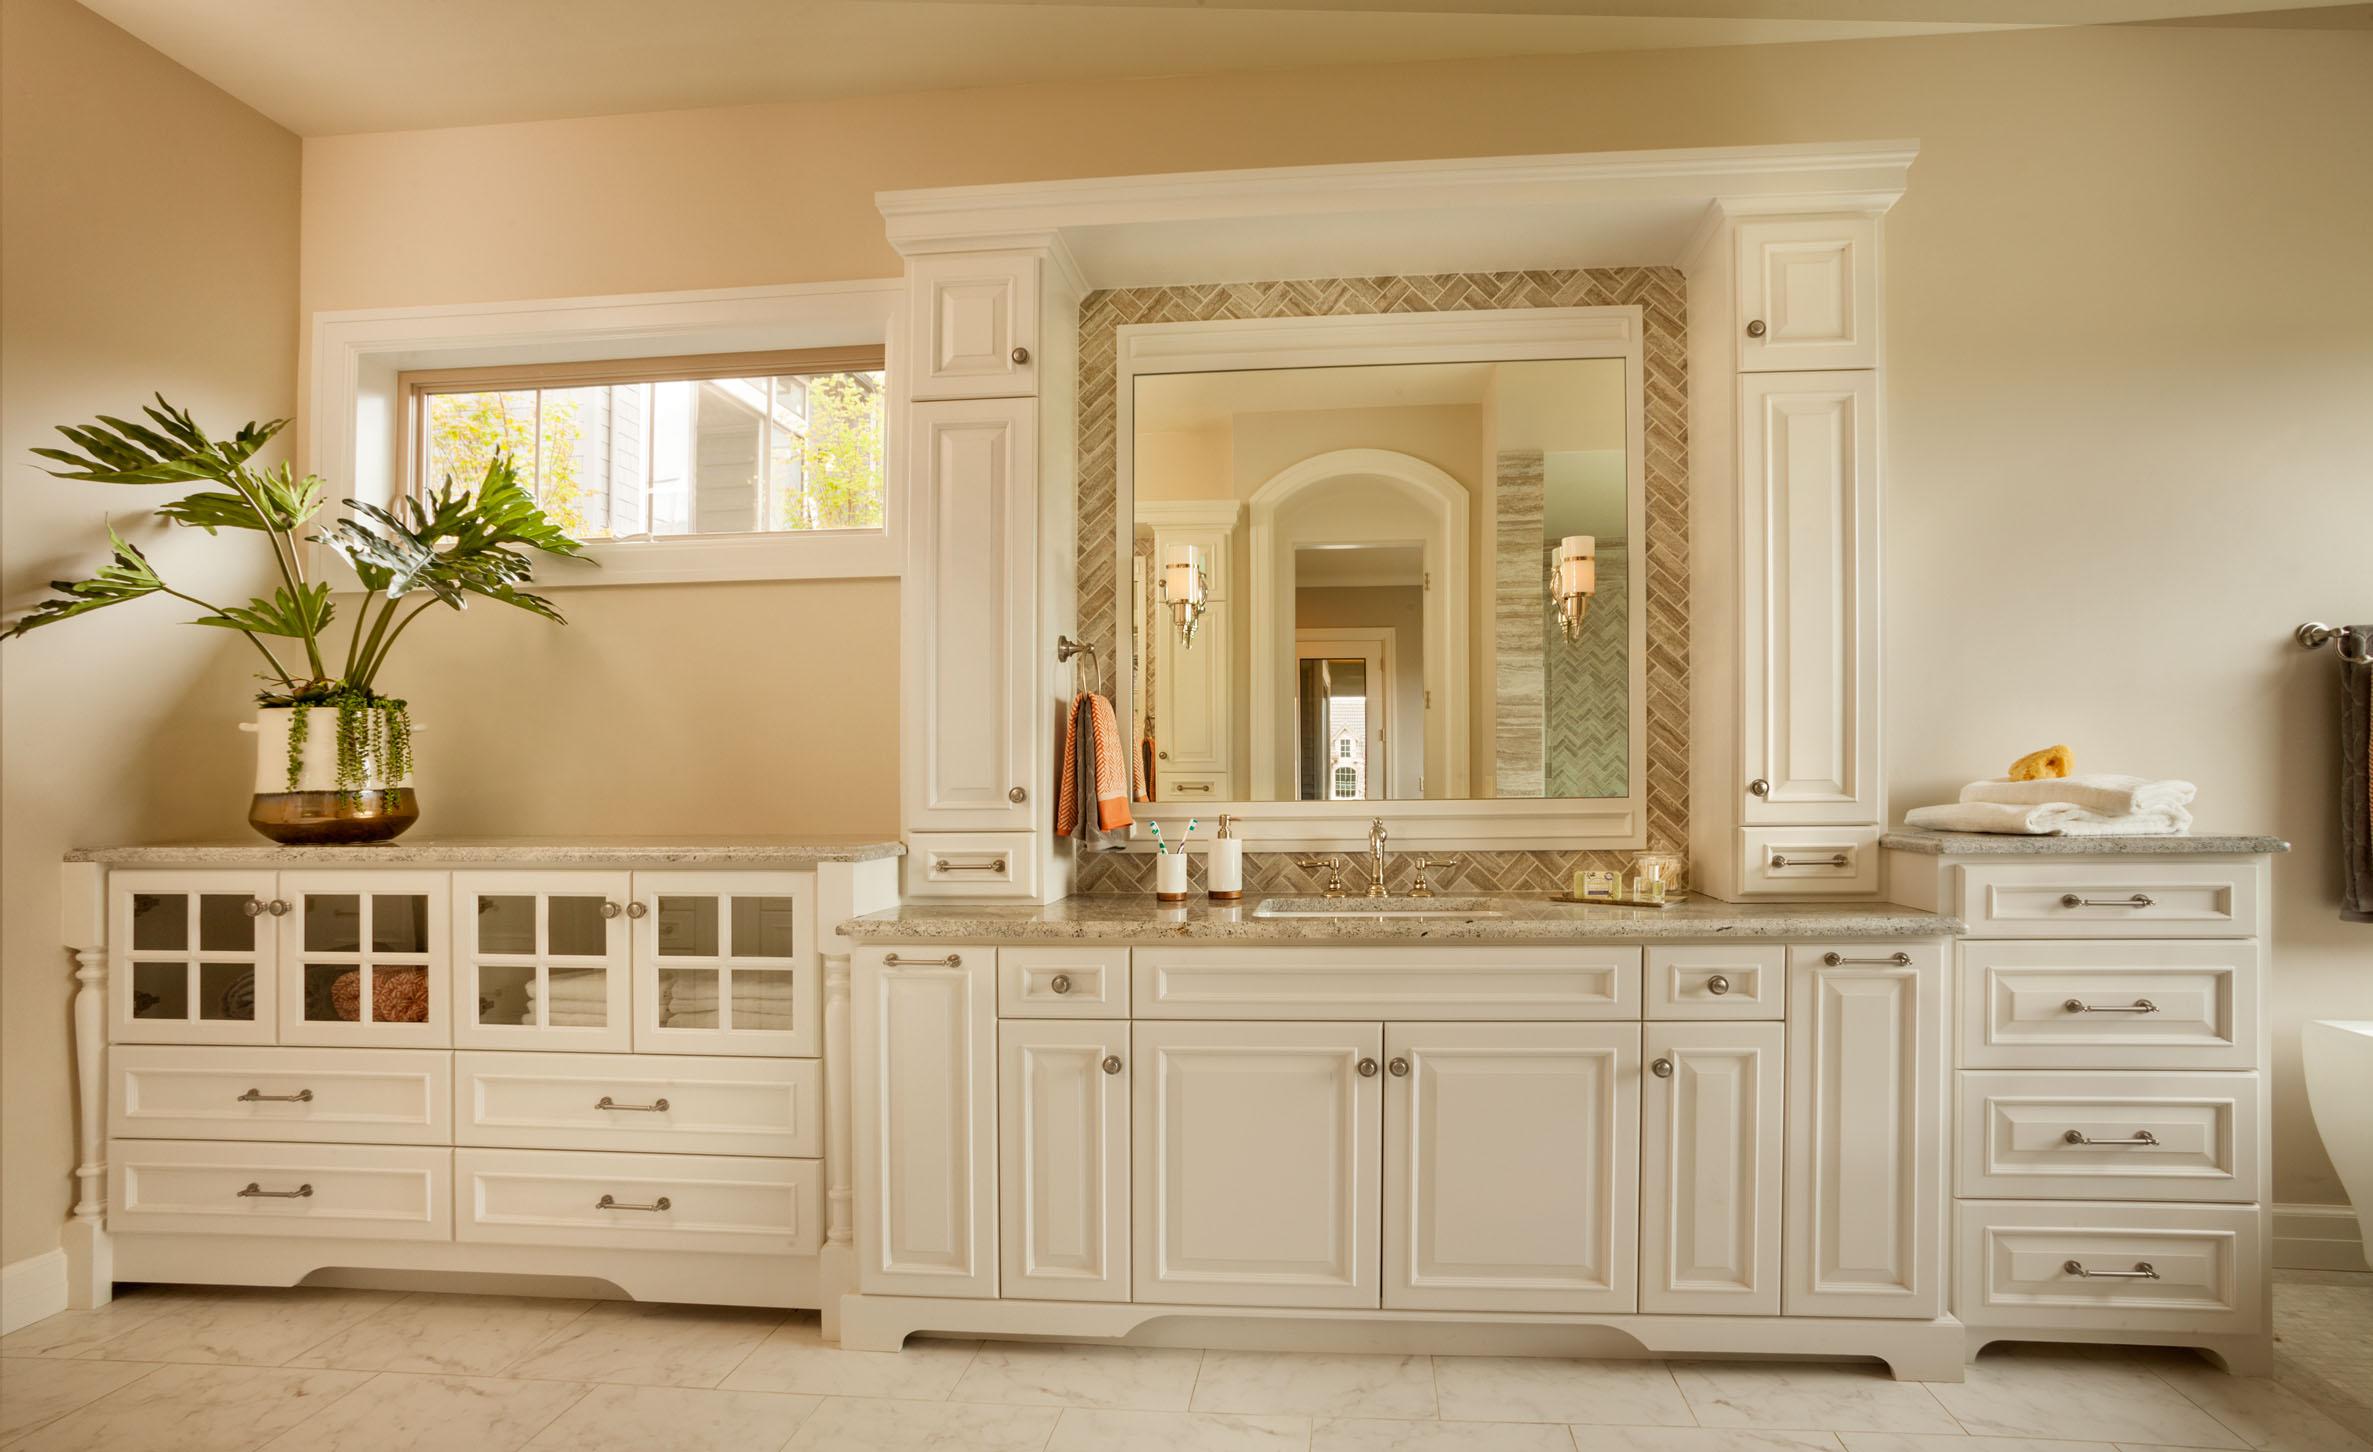 our top 5 bathroom designs garrison hullinger interior design stylish luxury in american spirit s master bathroom